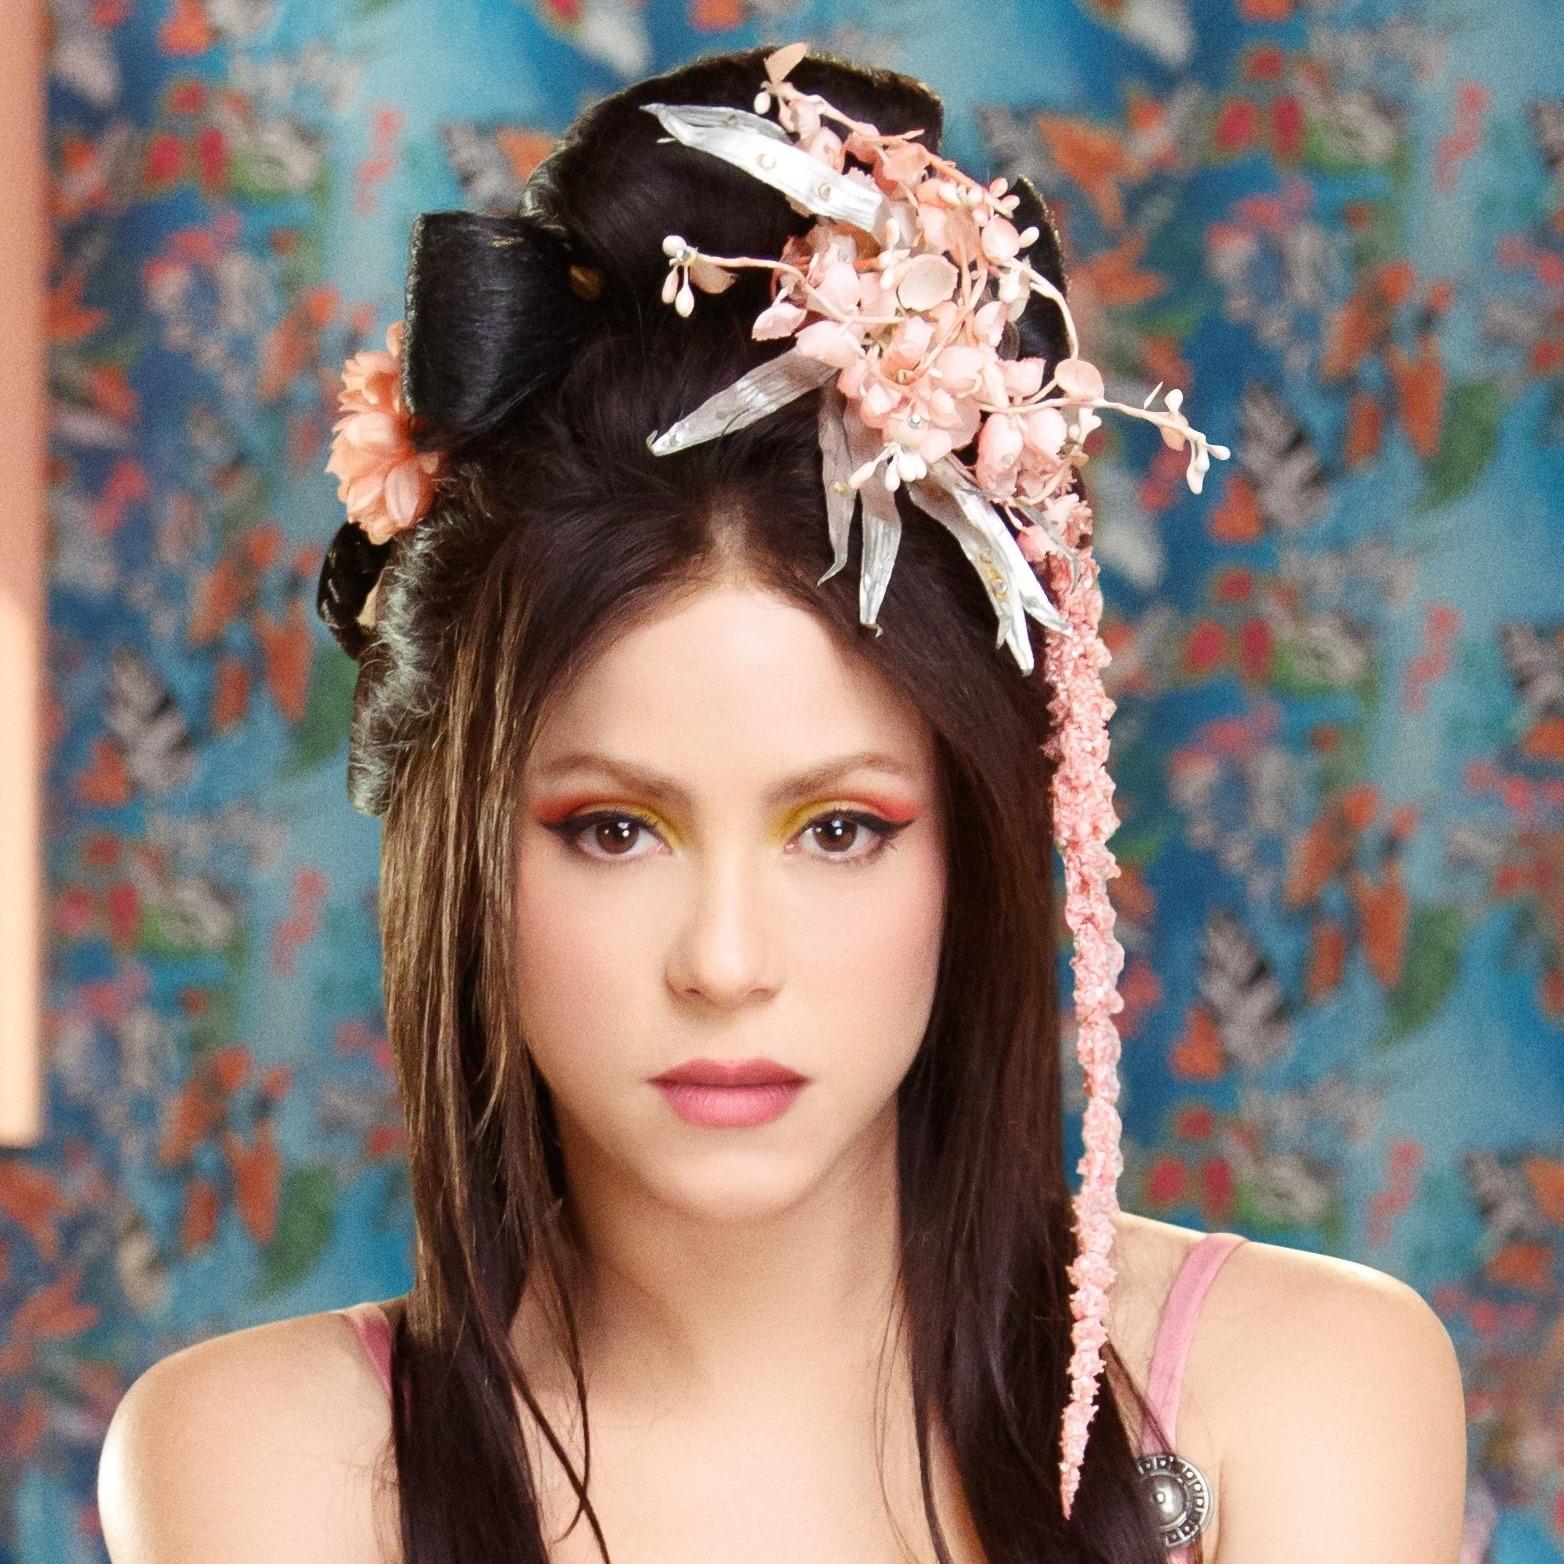 Shakira - Me Gusta - retour - single - look - brune